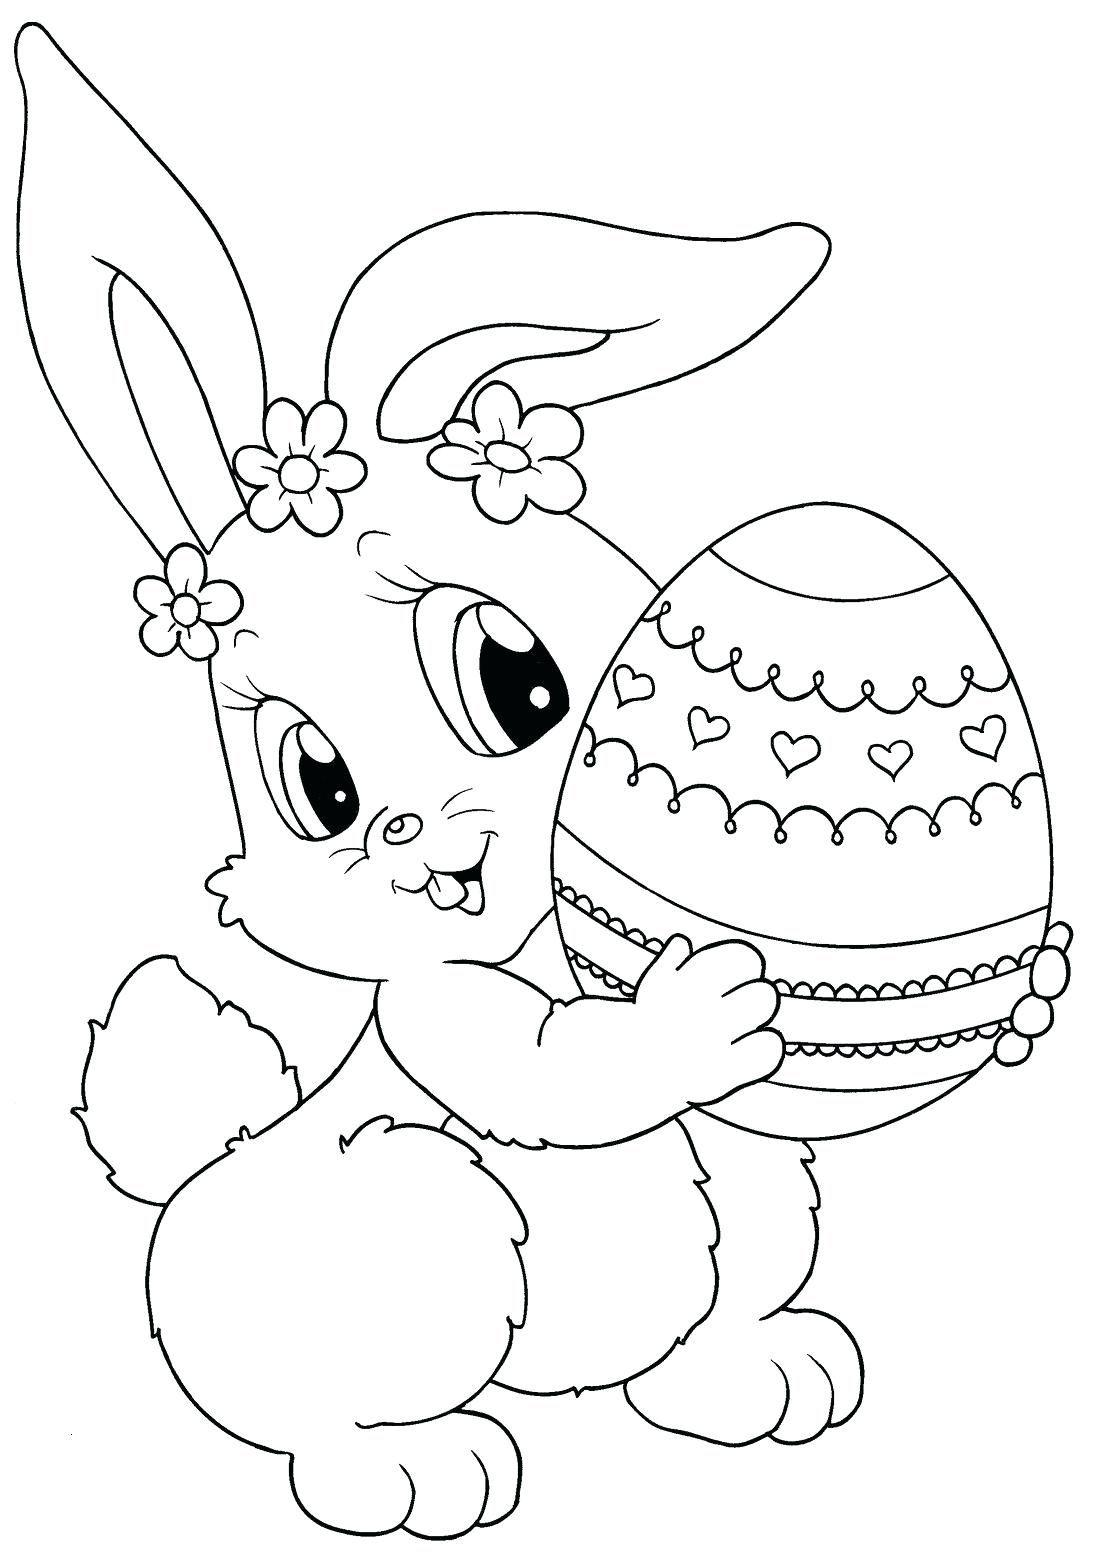 Pin By Karen Summey On Amigurumi Bunny Coloring Pages Easter Bunny Colouring Easter Coloring Book